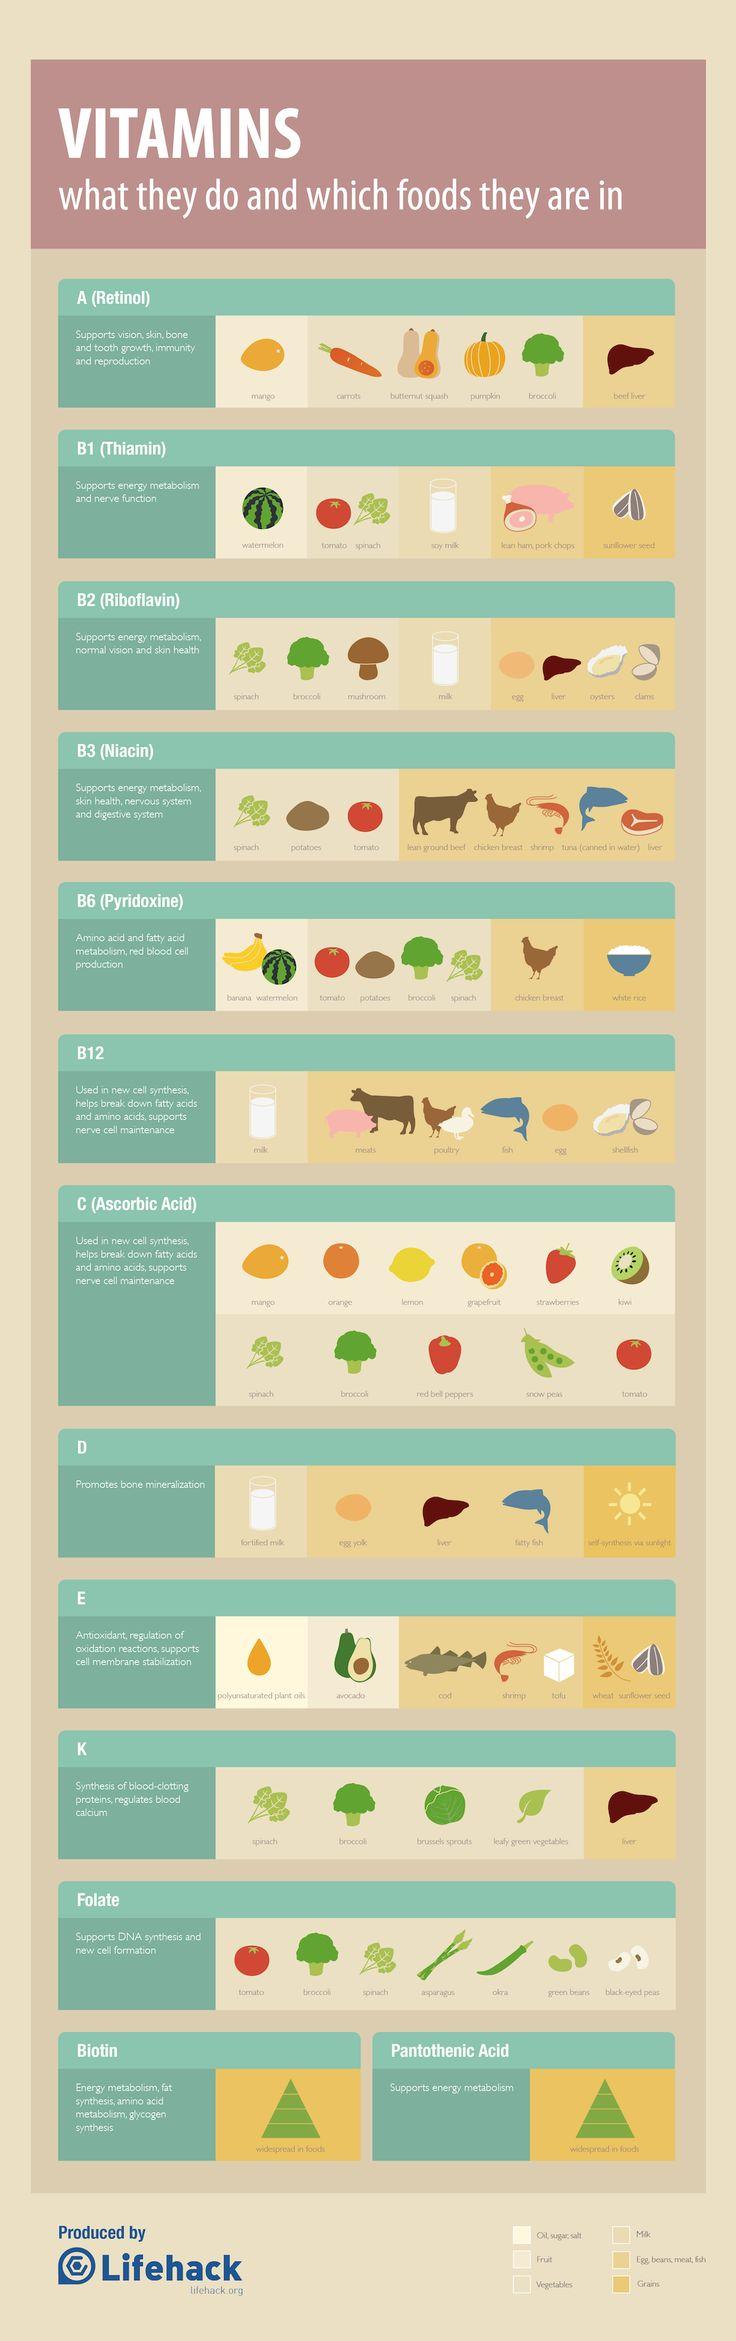 Vitamin mineral info!